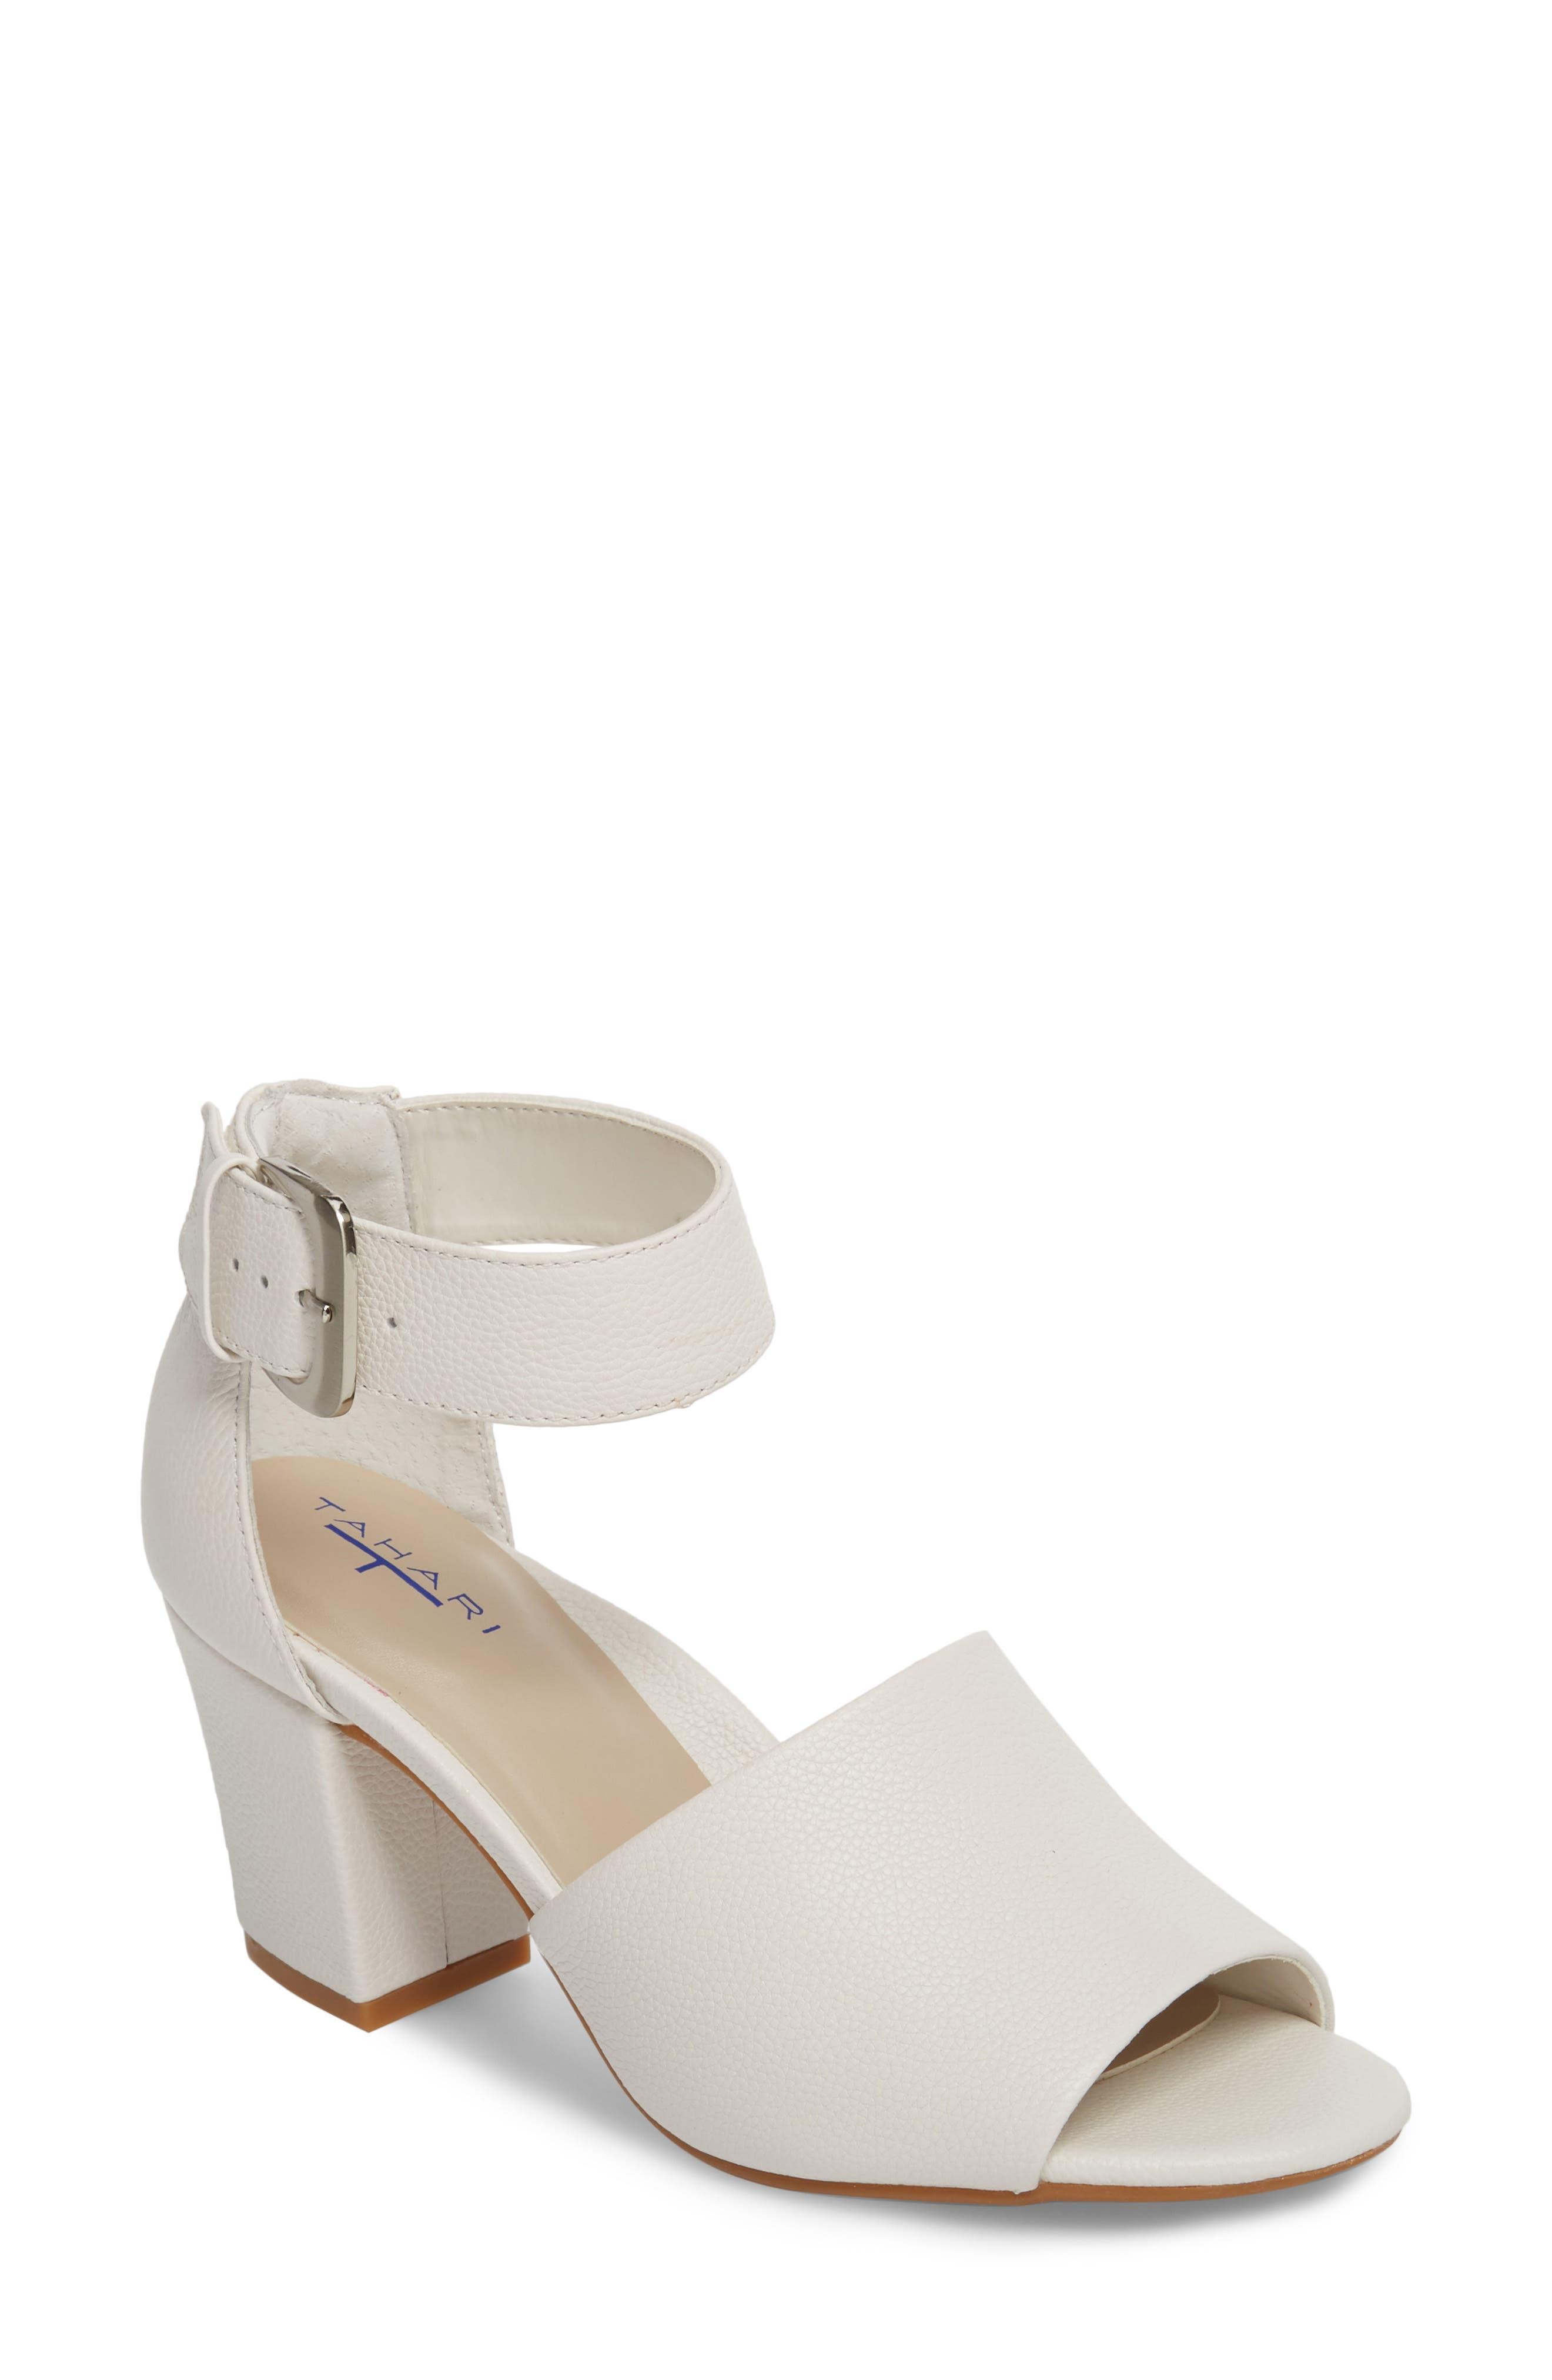 Piper Sandal,                             Main thumbnail 1, color,                             WARM WHITE LEATHER